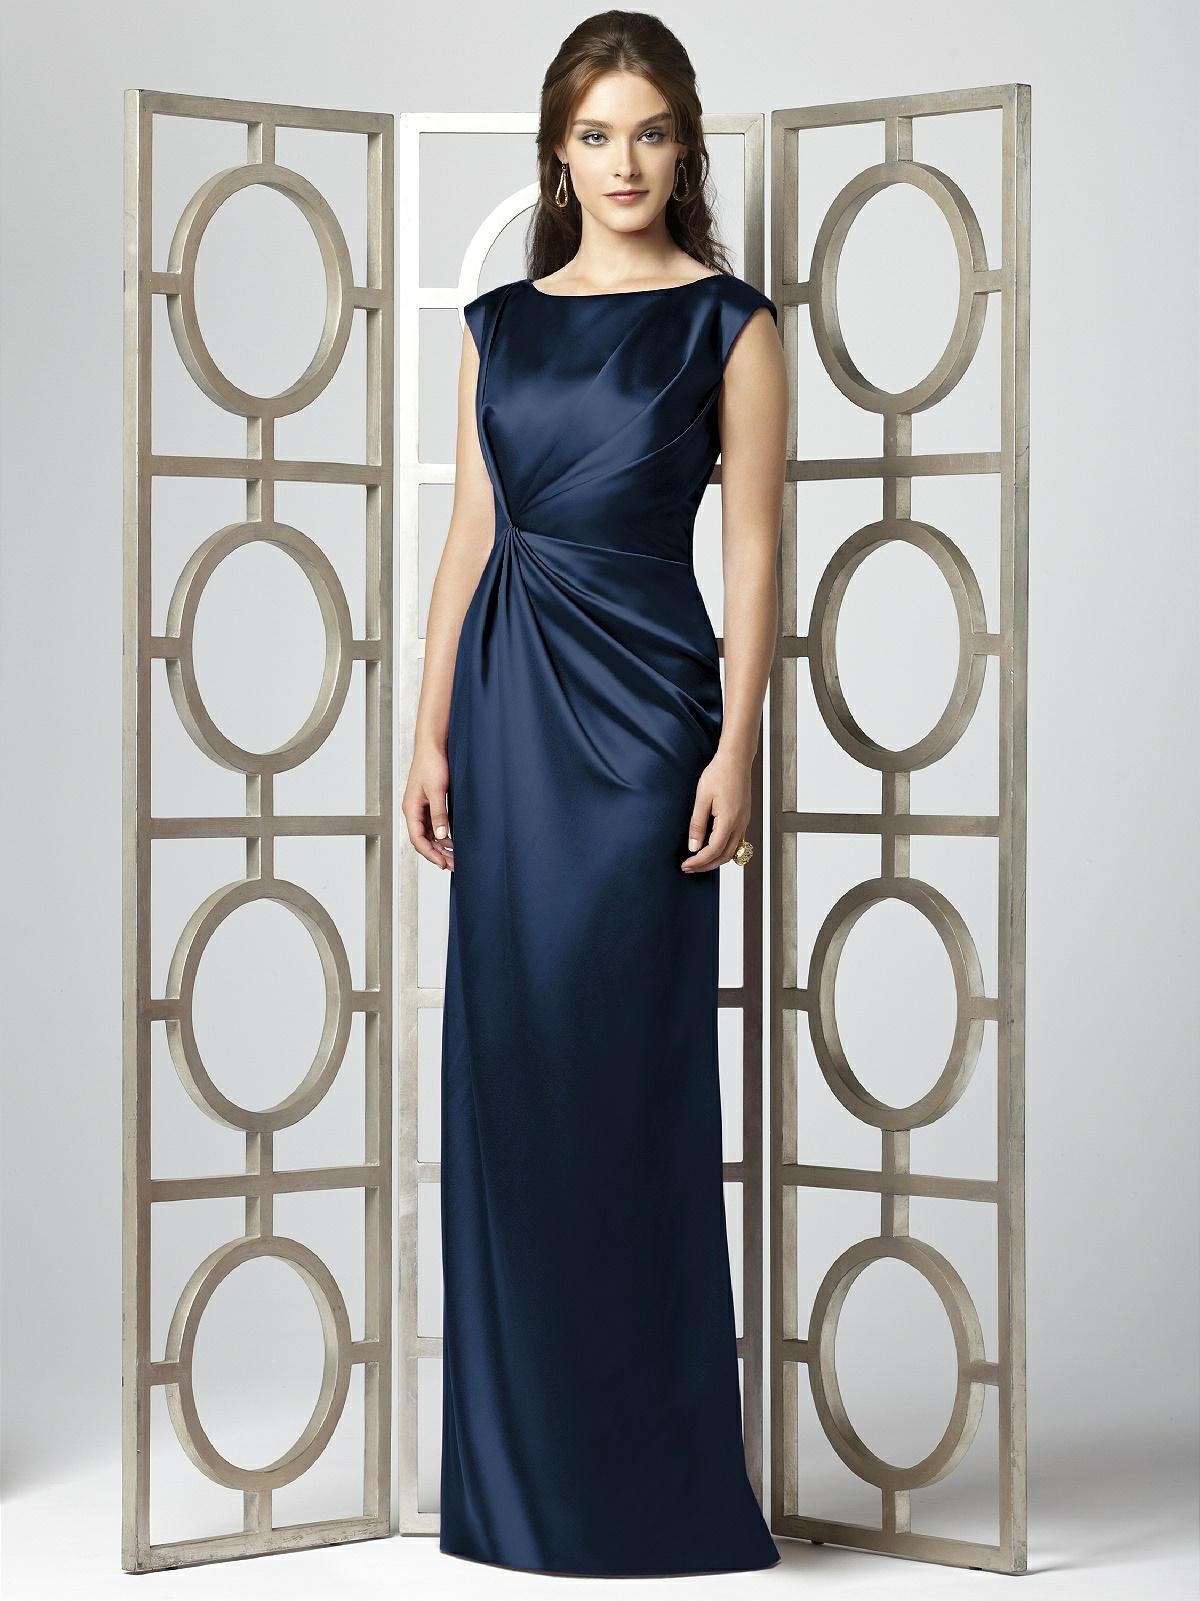 Midnight blue bridesmaid dress in satin